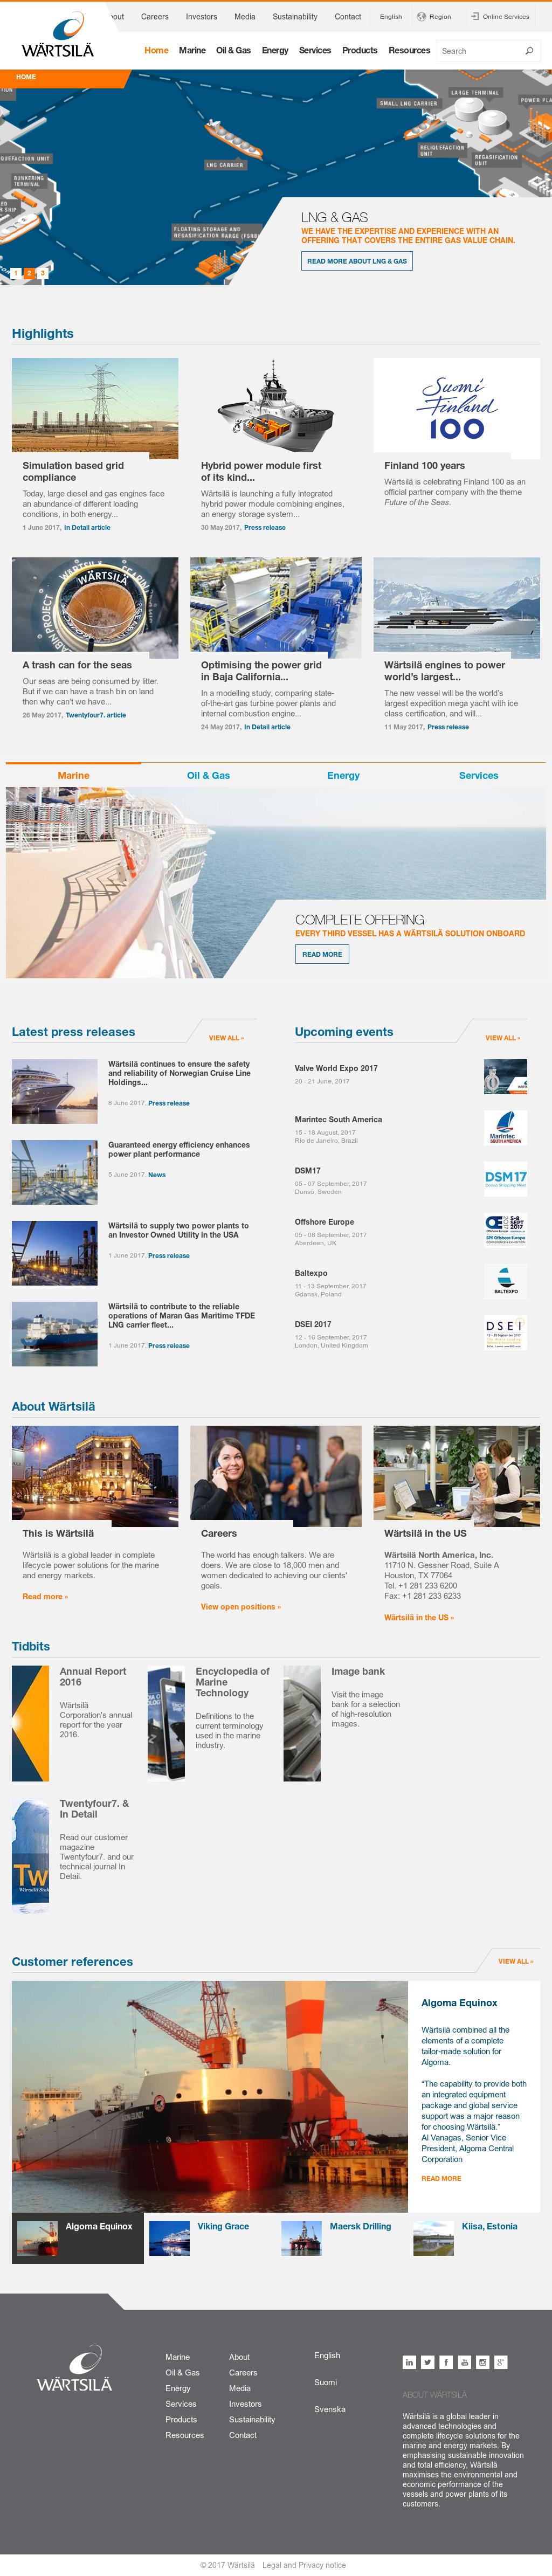 Wartsila Competitors, Revenue and Employees - Owler Company Profile